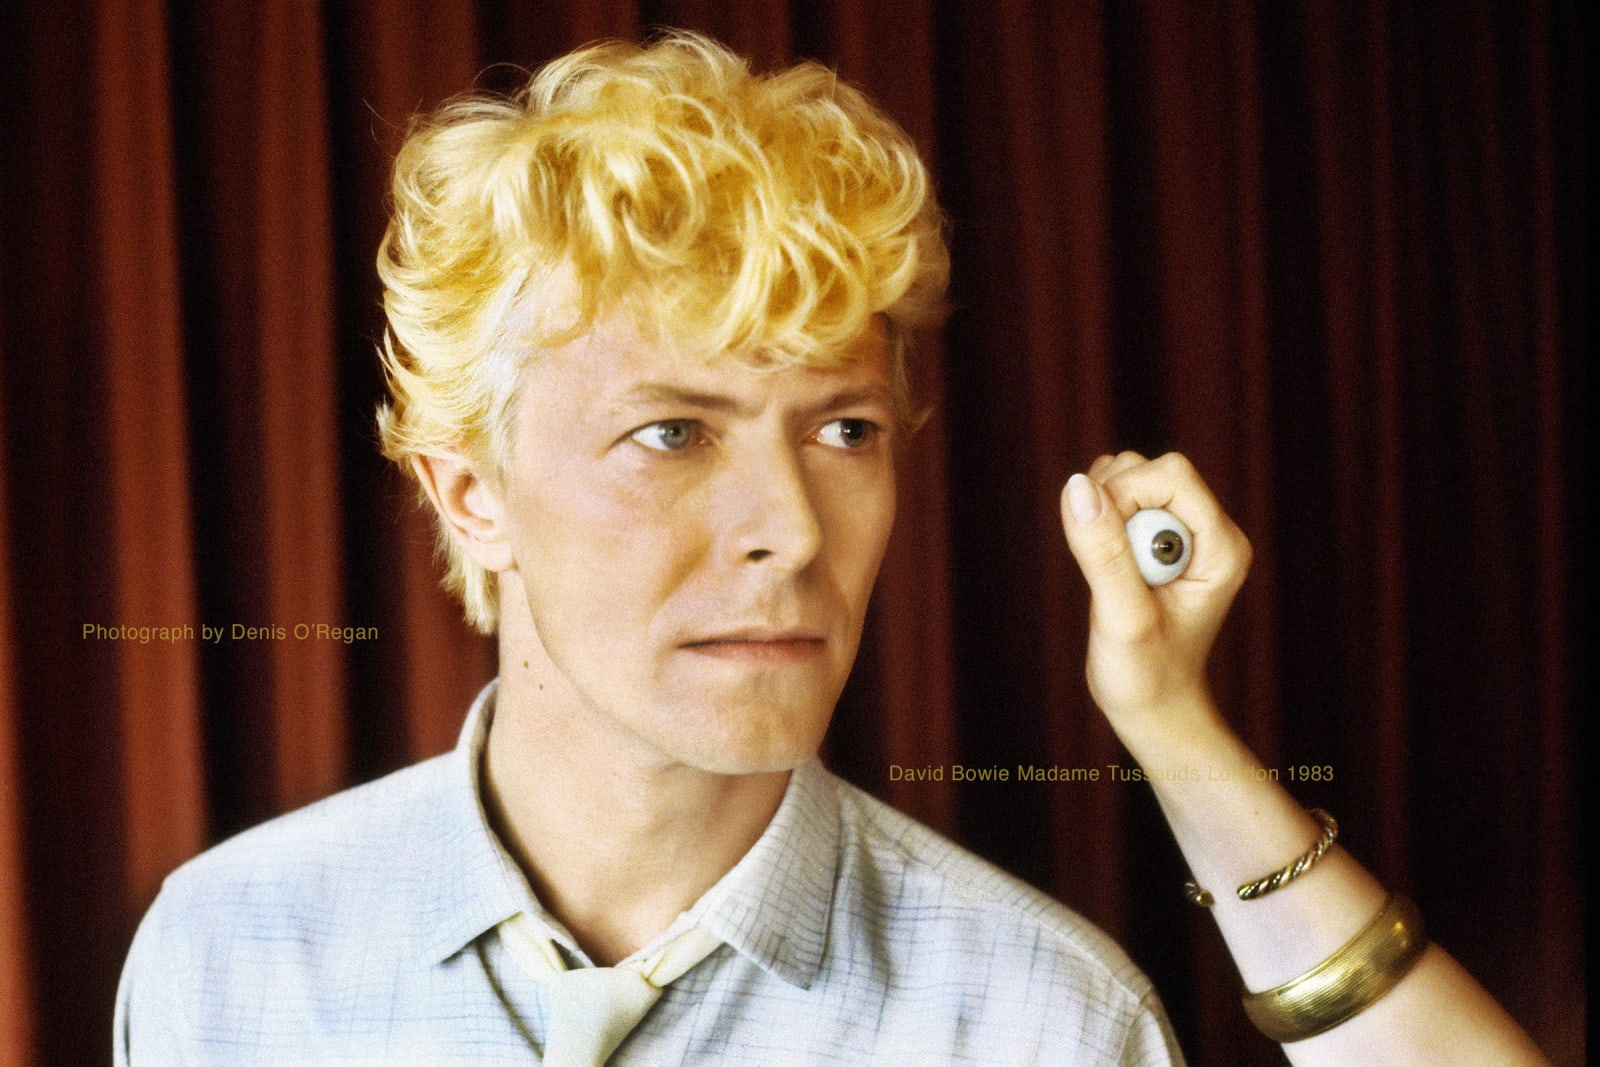 DAVID BOWIE, David Bowie Madame Tussaud's, 1983